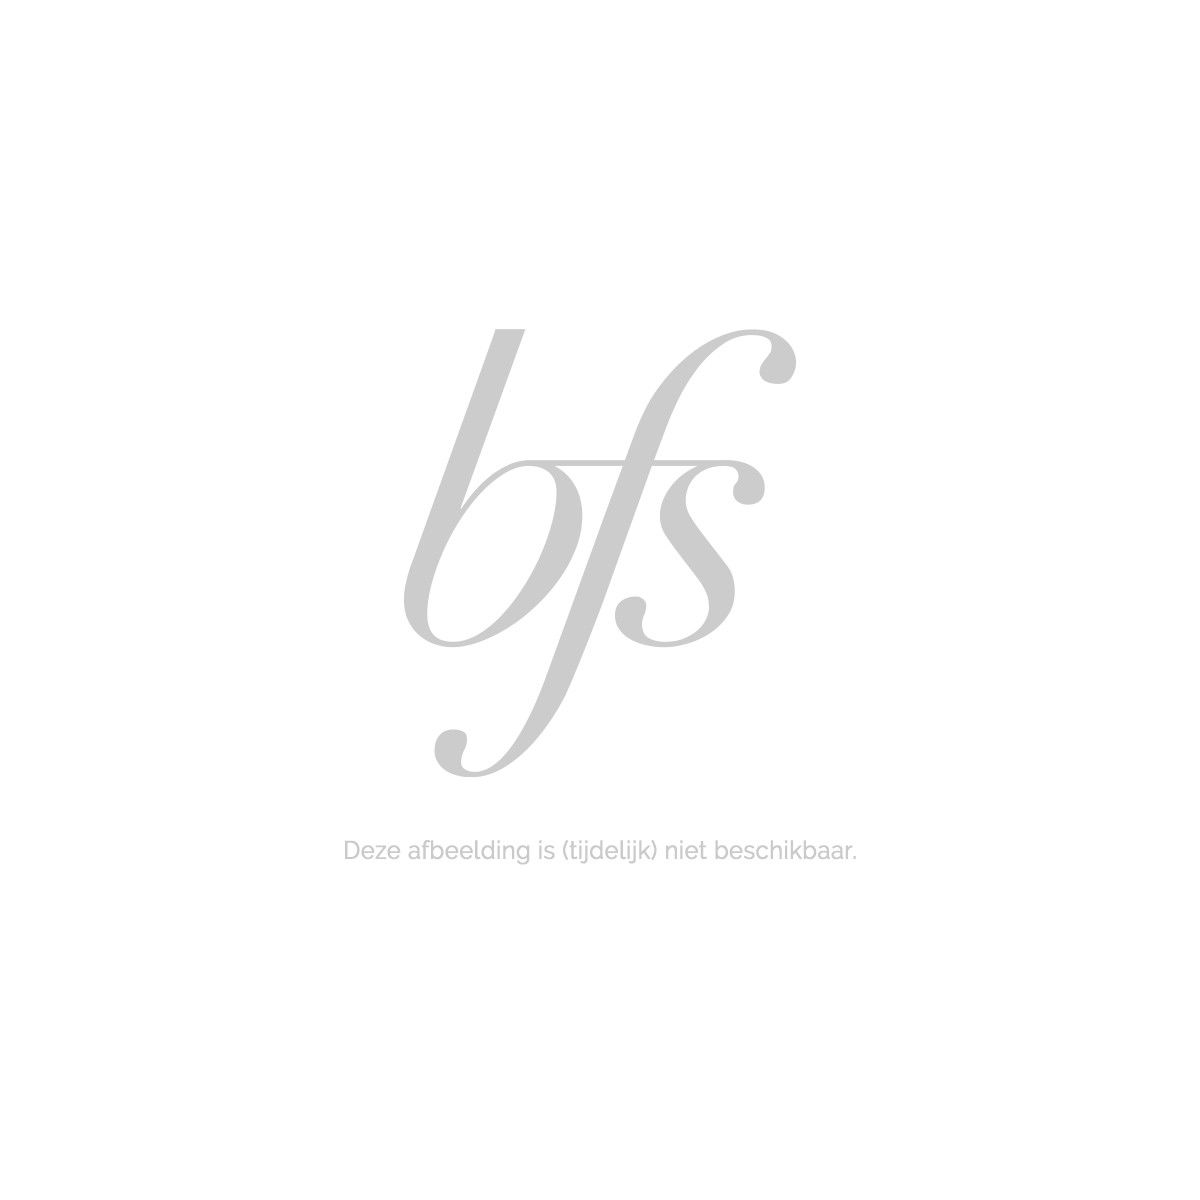 Le Papier Moisturizing Lipstick Glossy Nudes Blush 6 G